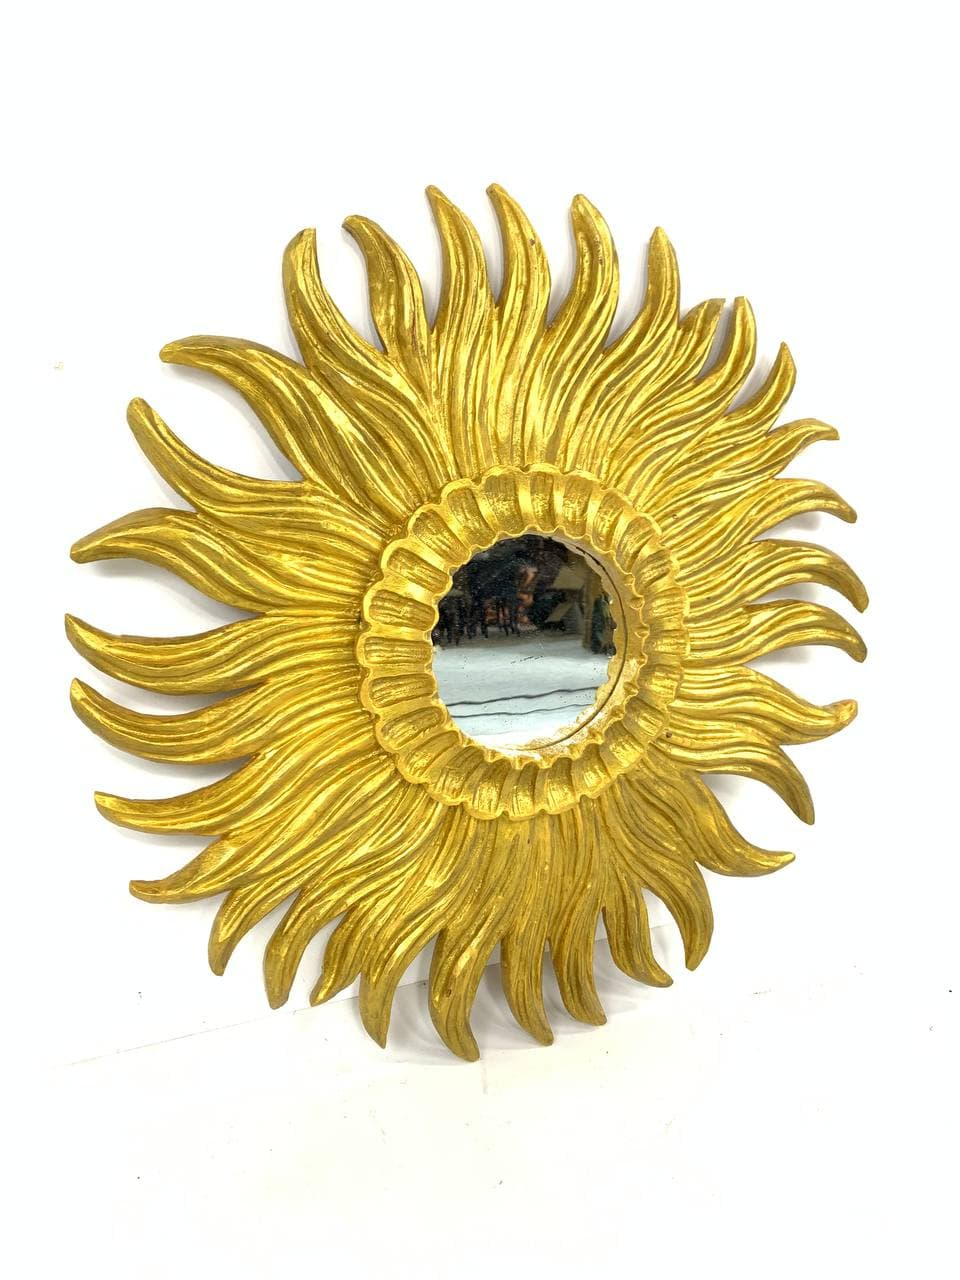 Винтажное зеркало из дерева в виде солнца